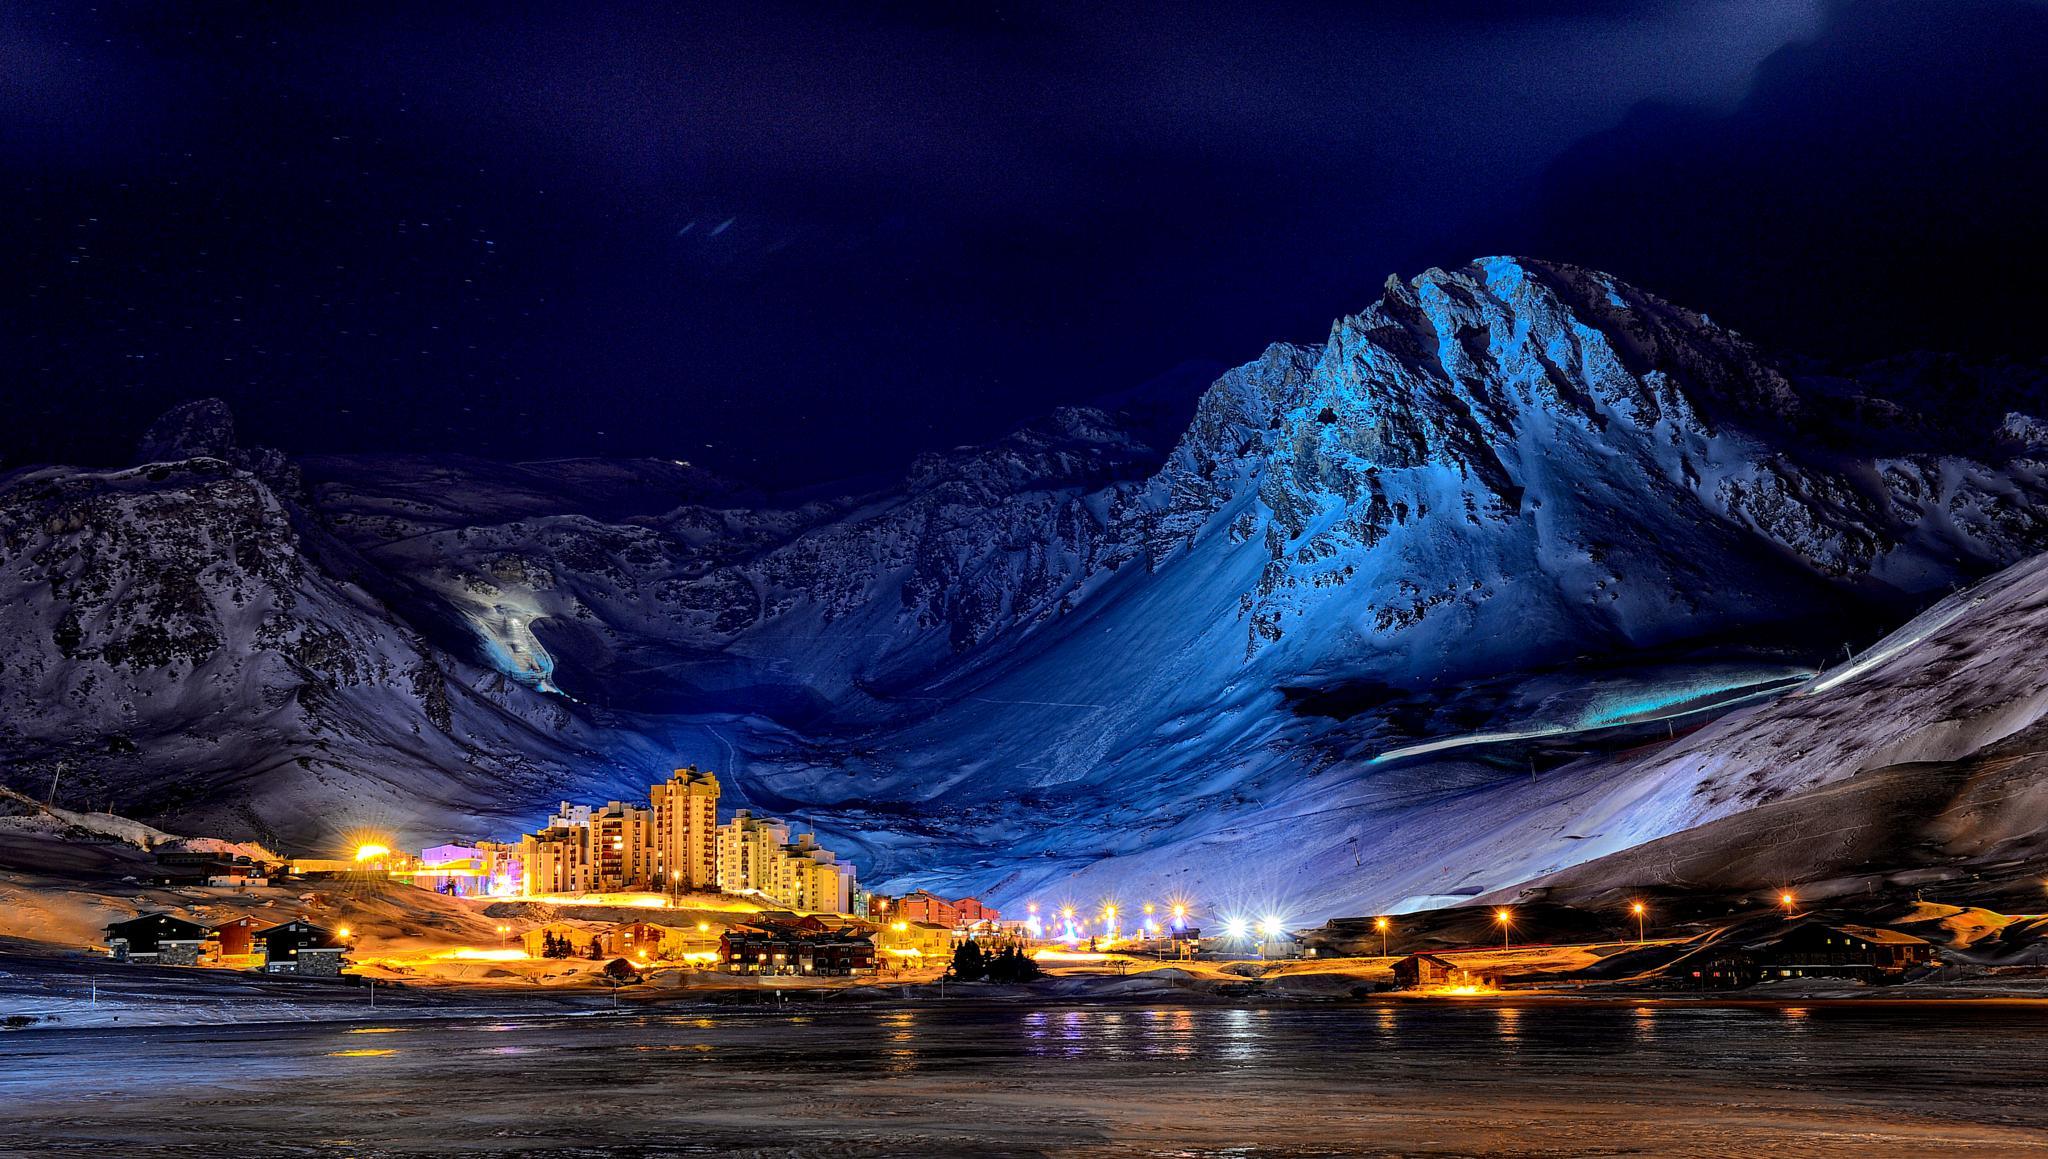 Photo in Landscape #france #alpes #tignes #snow #mountains #winter #ski #resort #blue #town